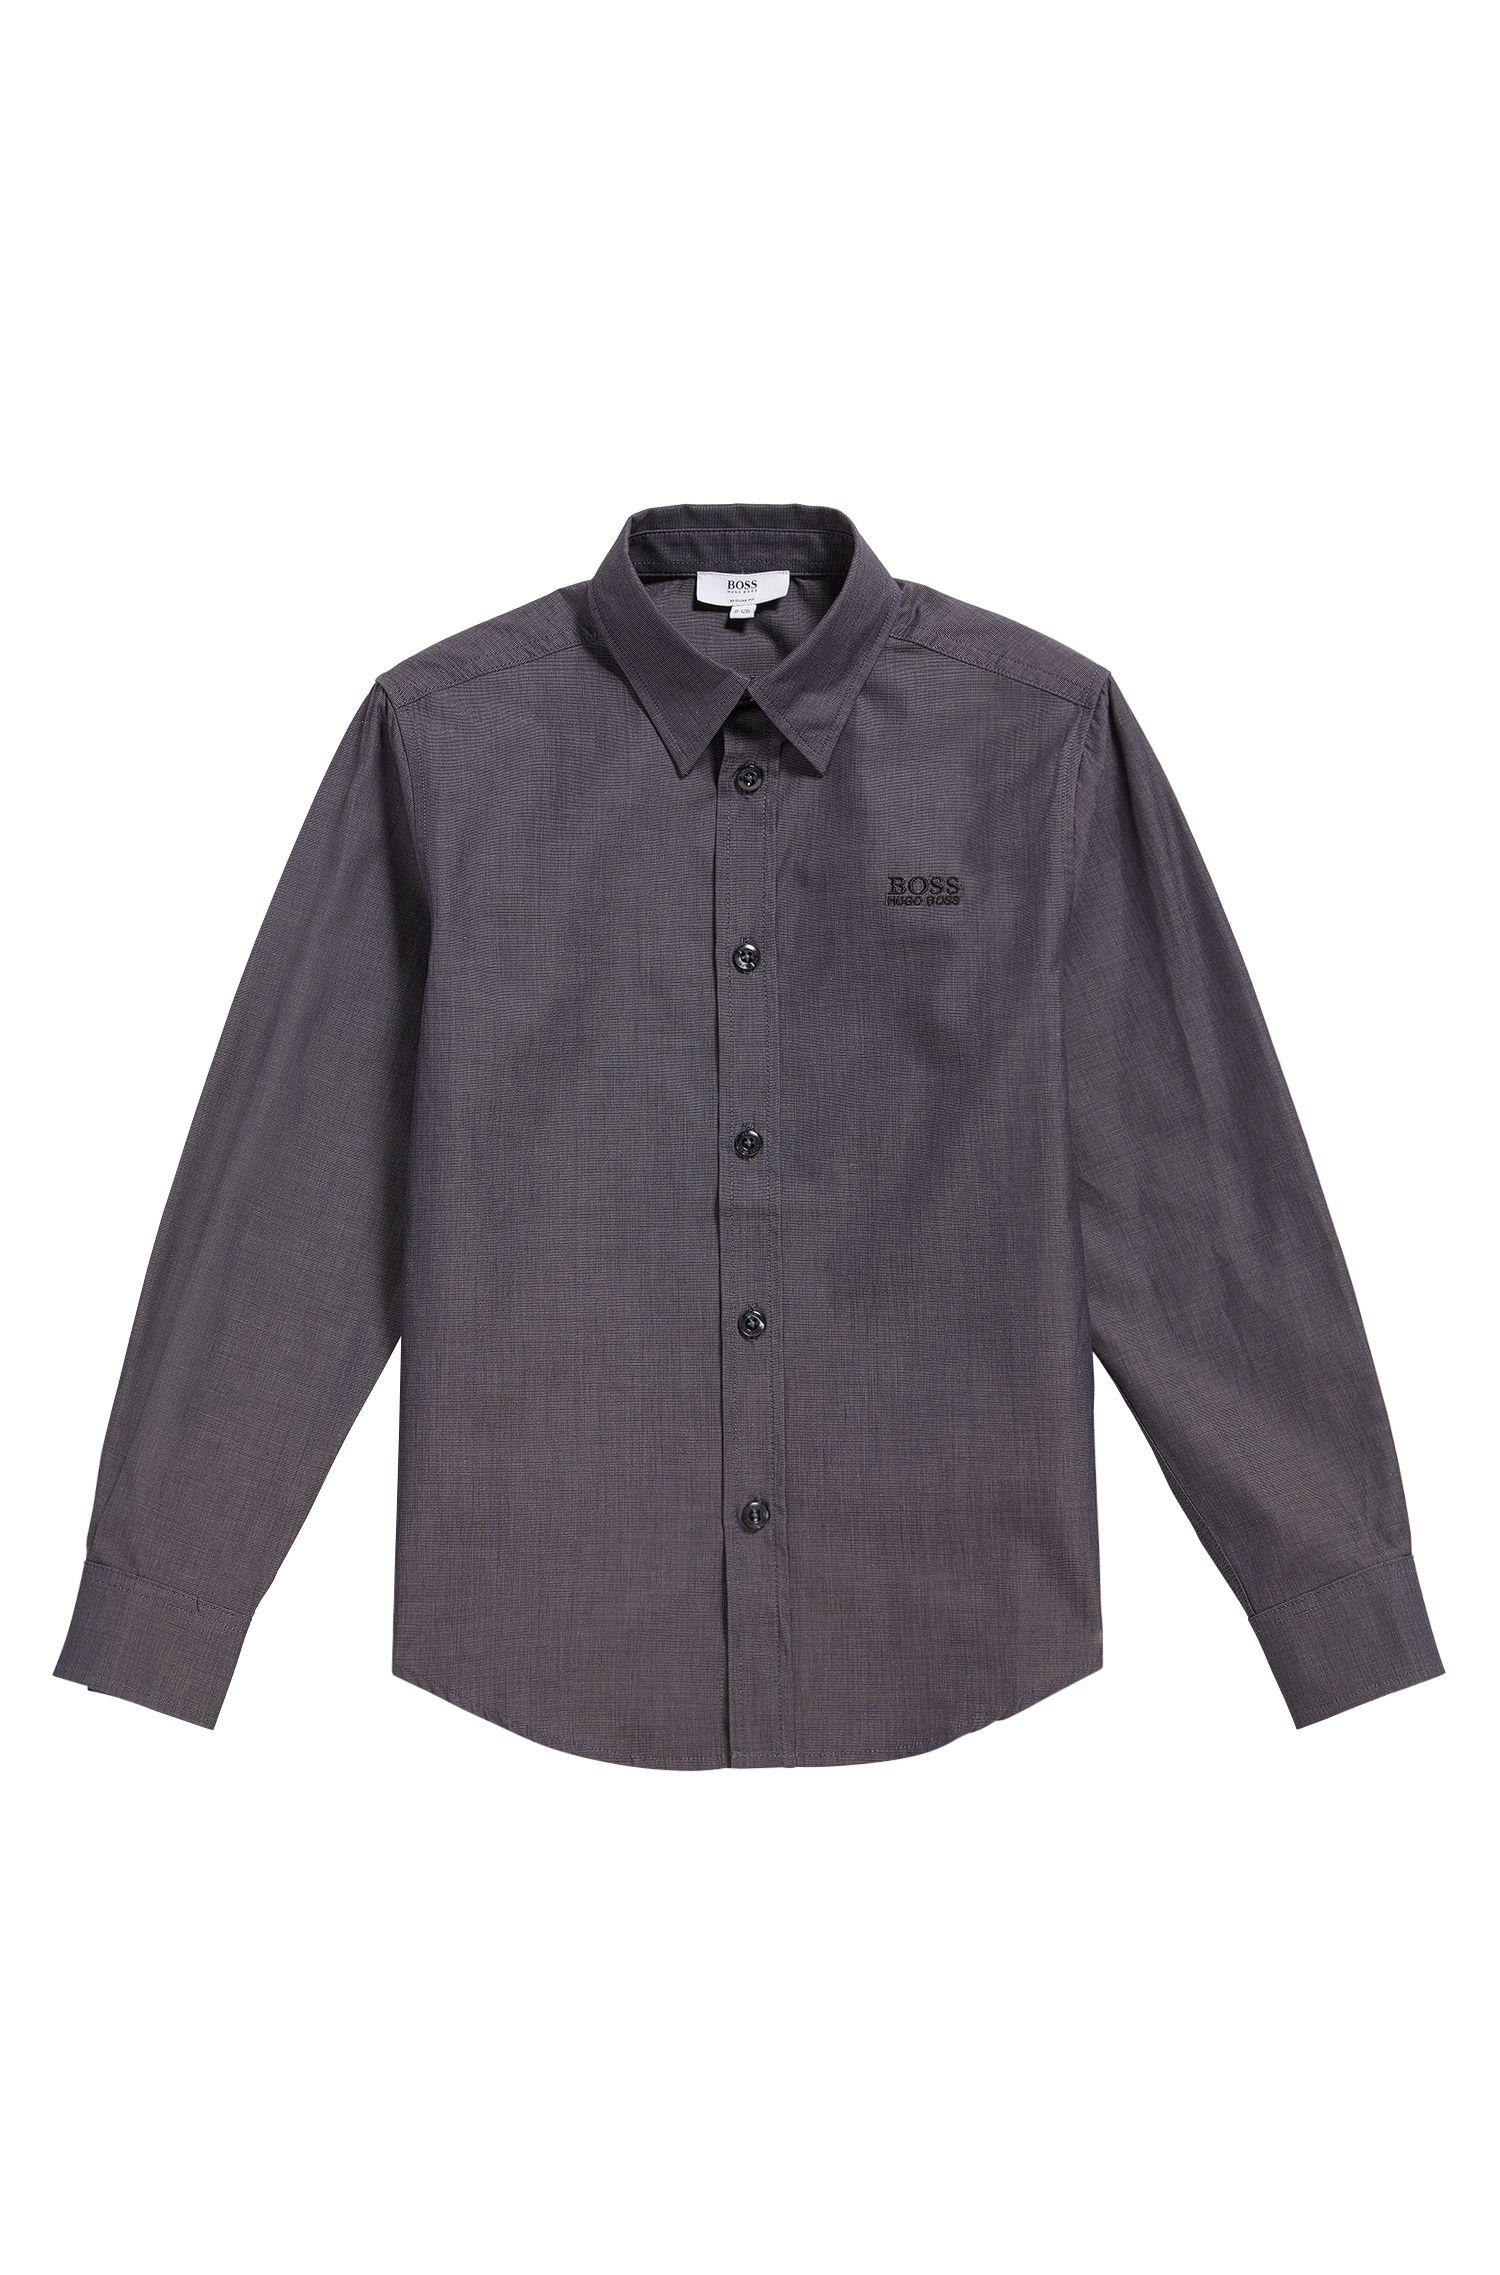 Camisa para niño en algodón con textura fina: 'J25977'